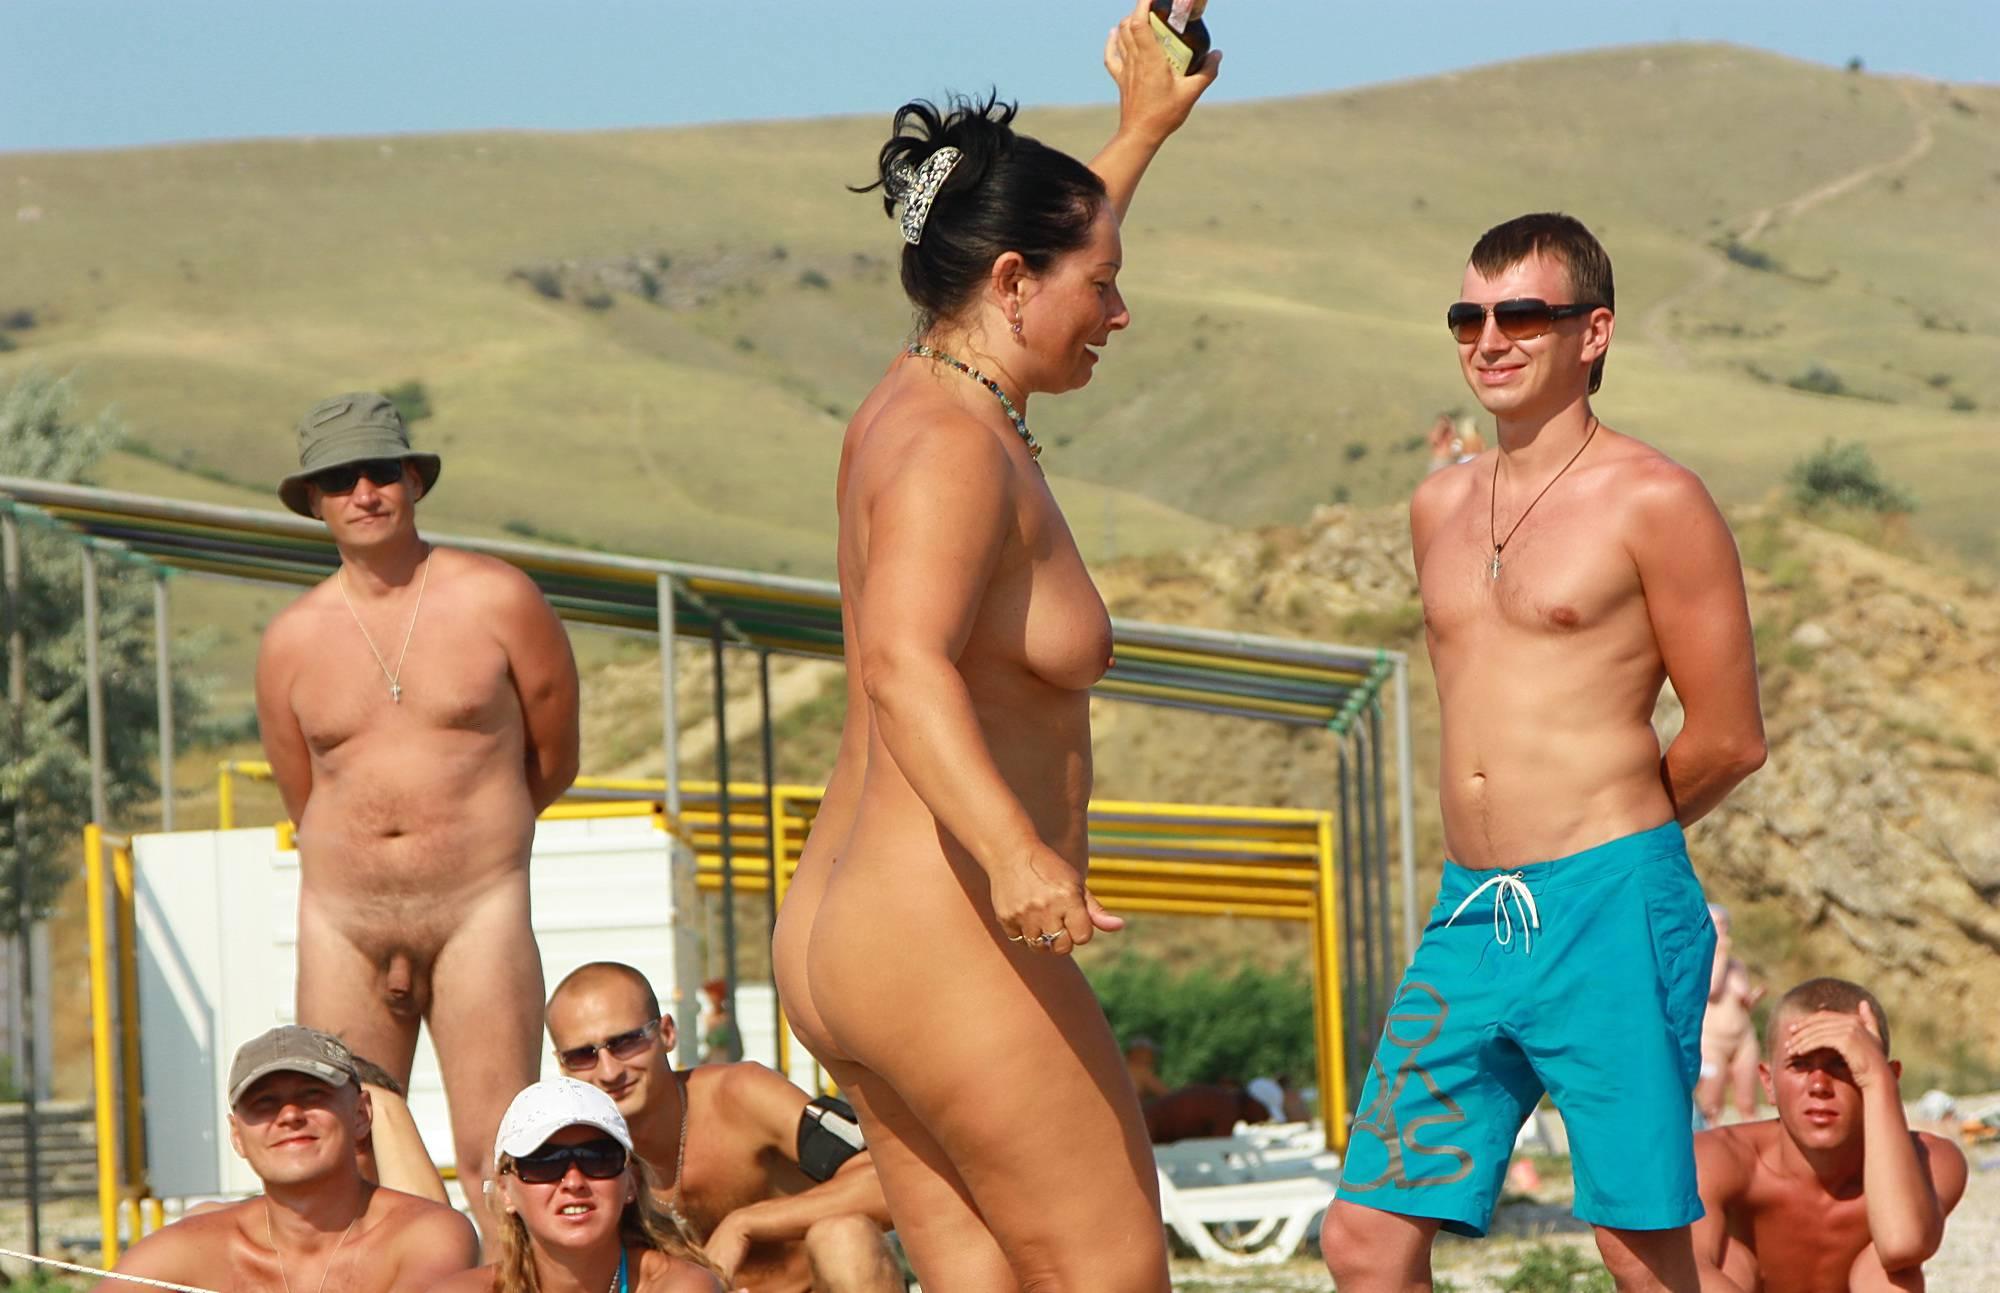 Naturist Beach Contest - 1